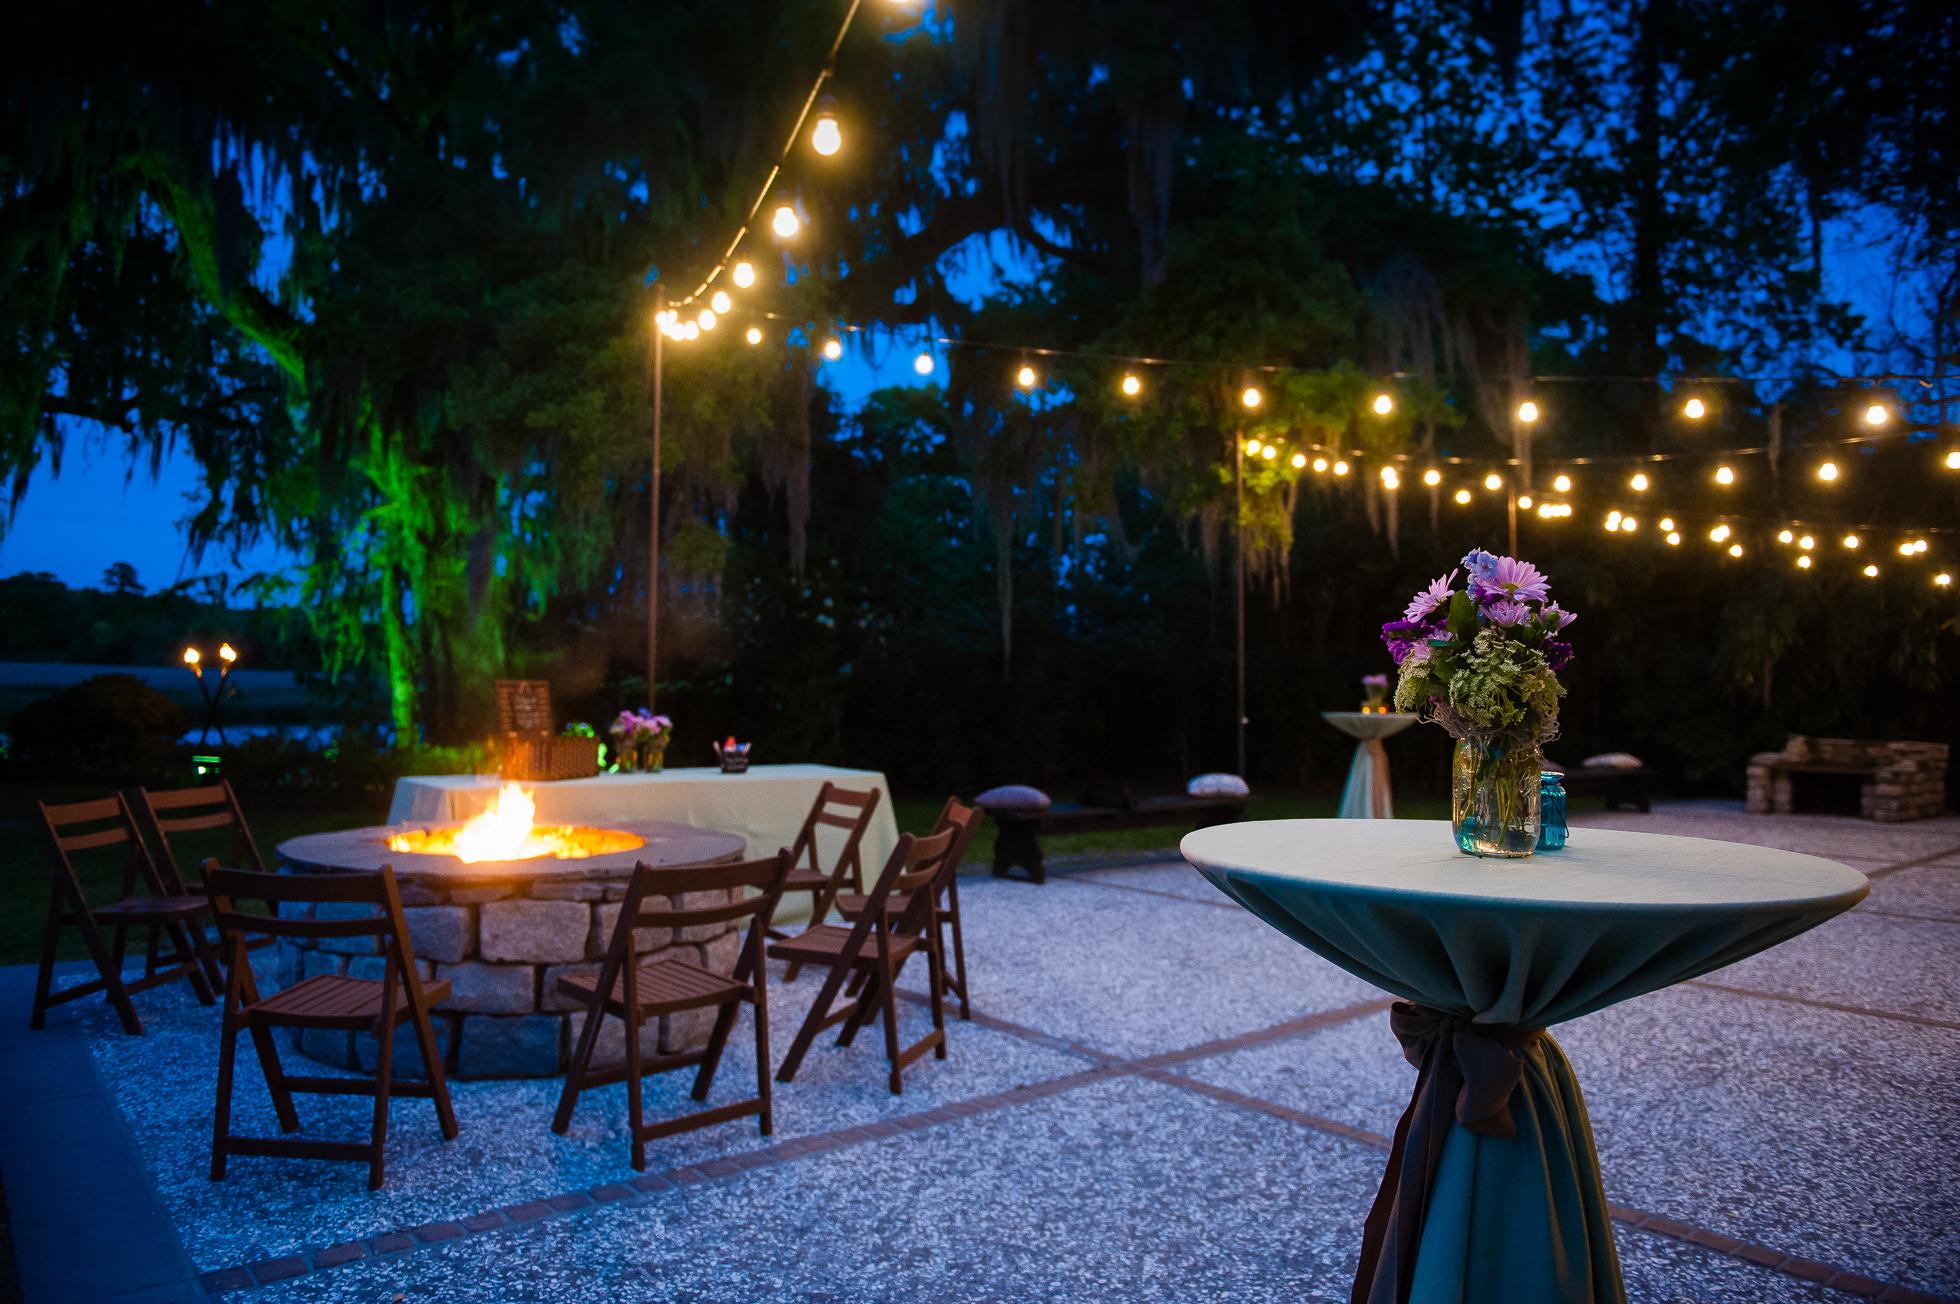 Magnolia Plantation carriage house wedding lit up at night